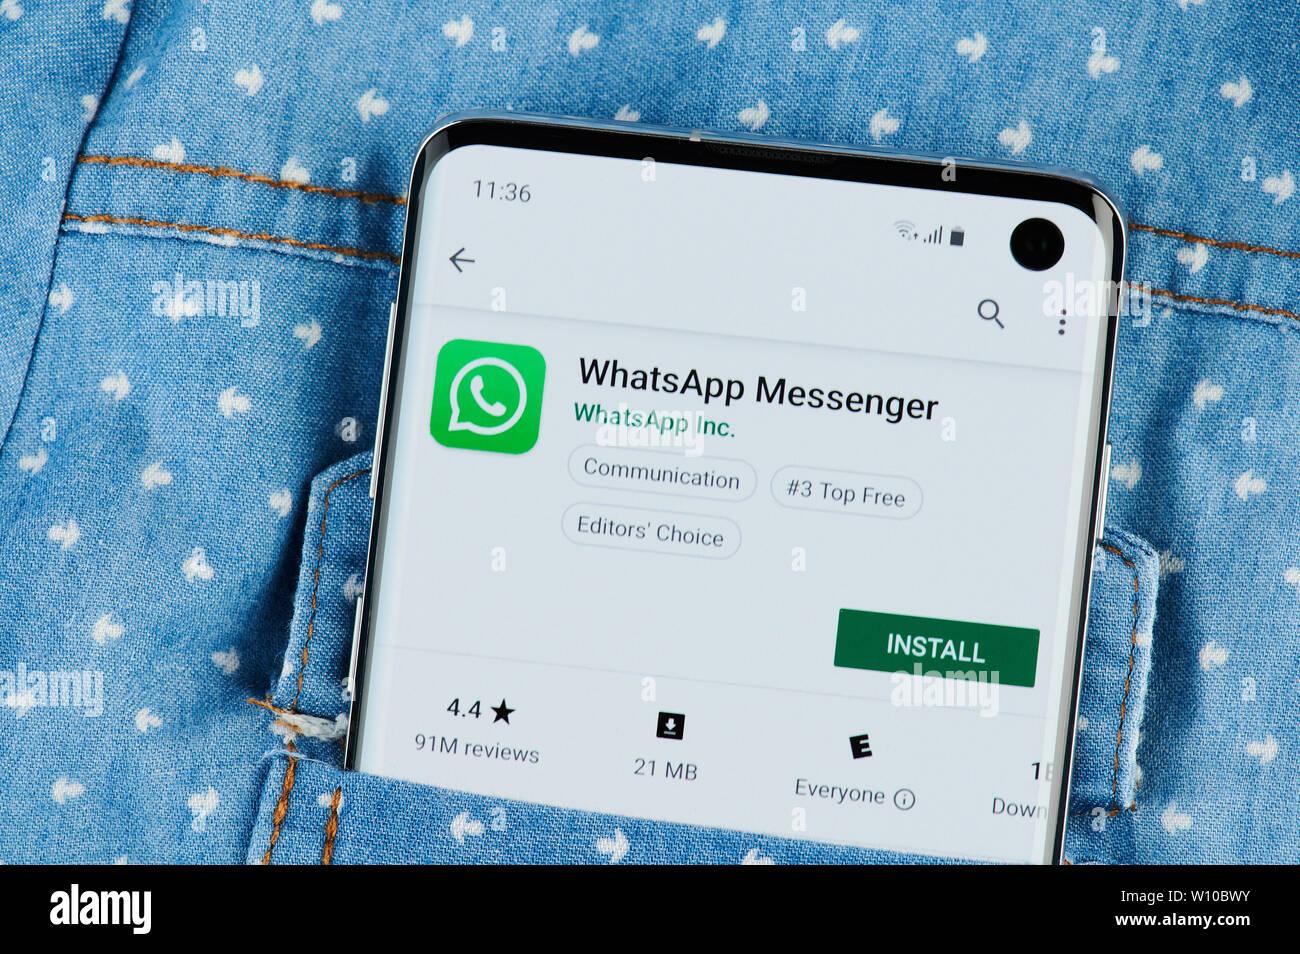 New york, USA - June 28, 2019: Whatsapp messenger application on